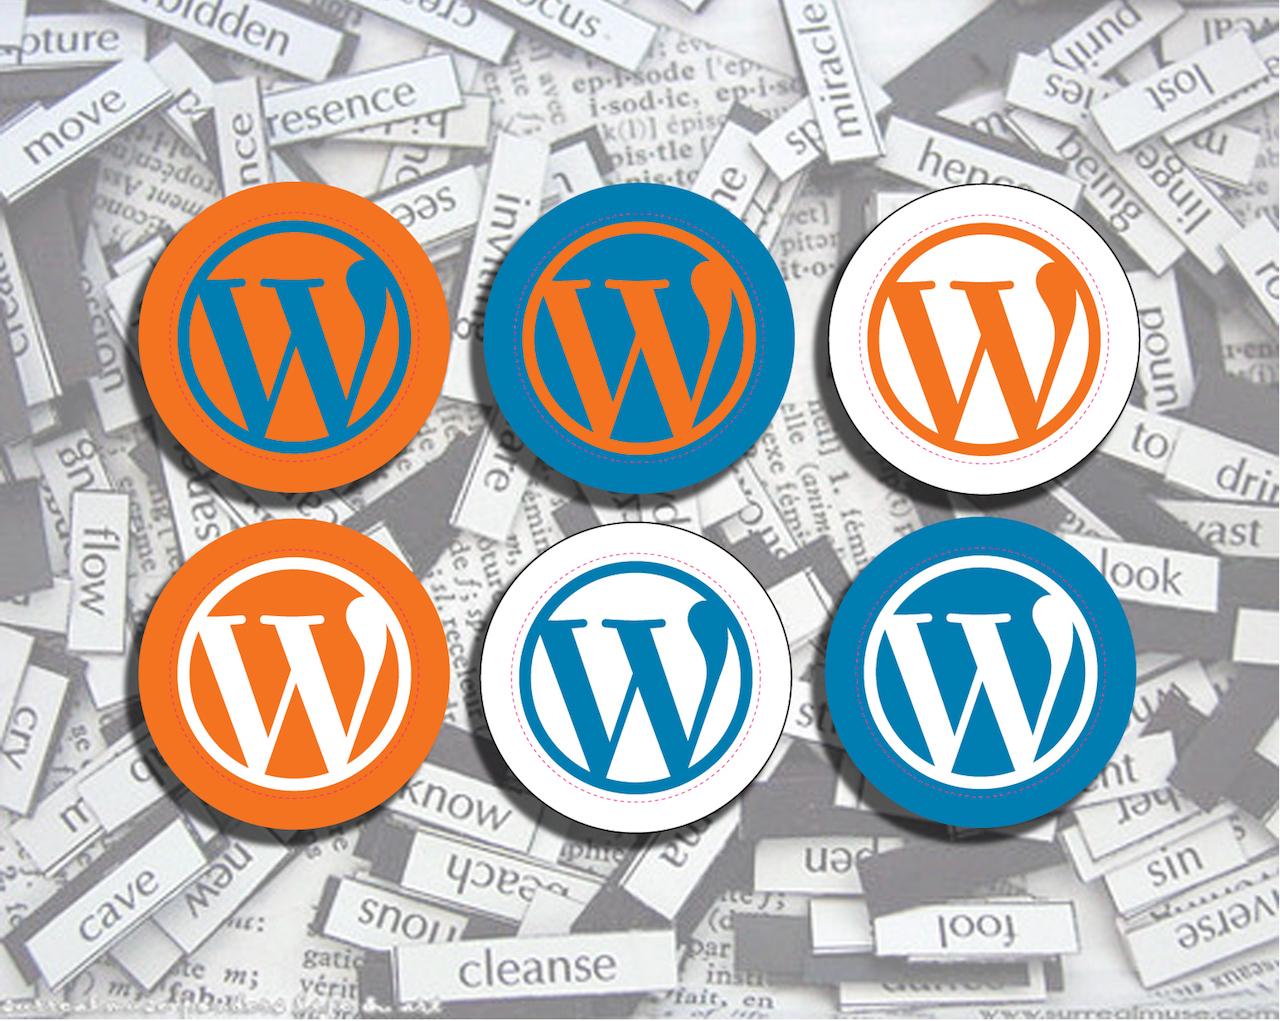 WordPressのステッカー